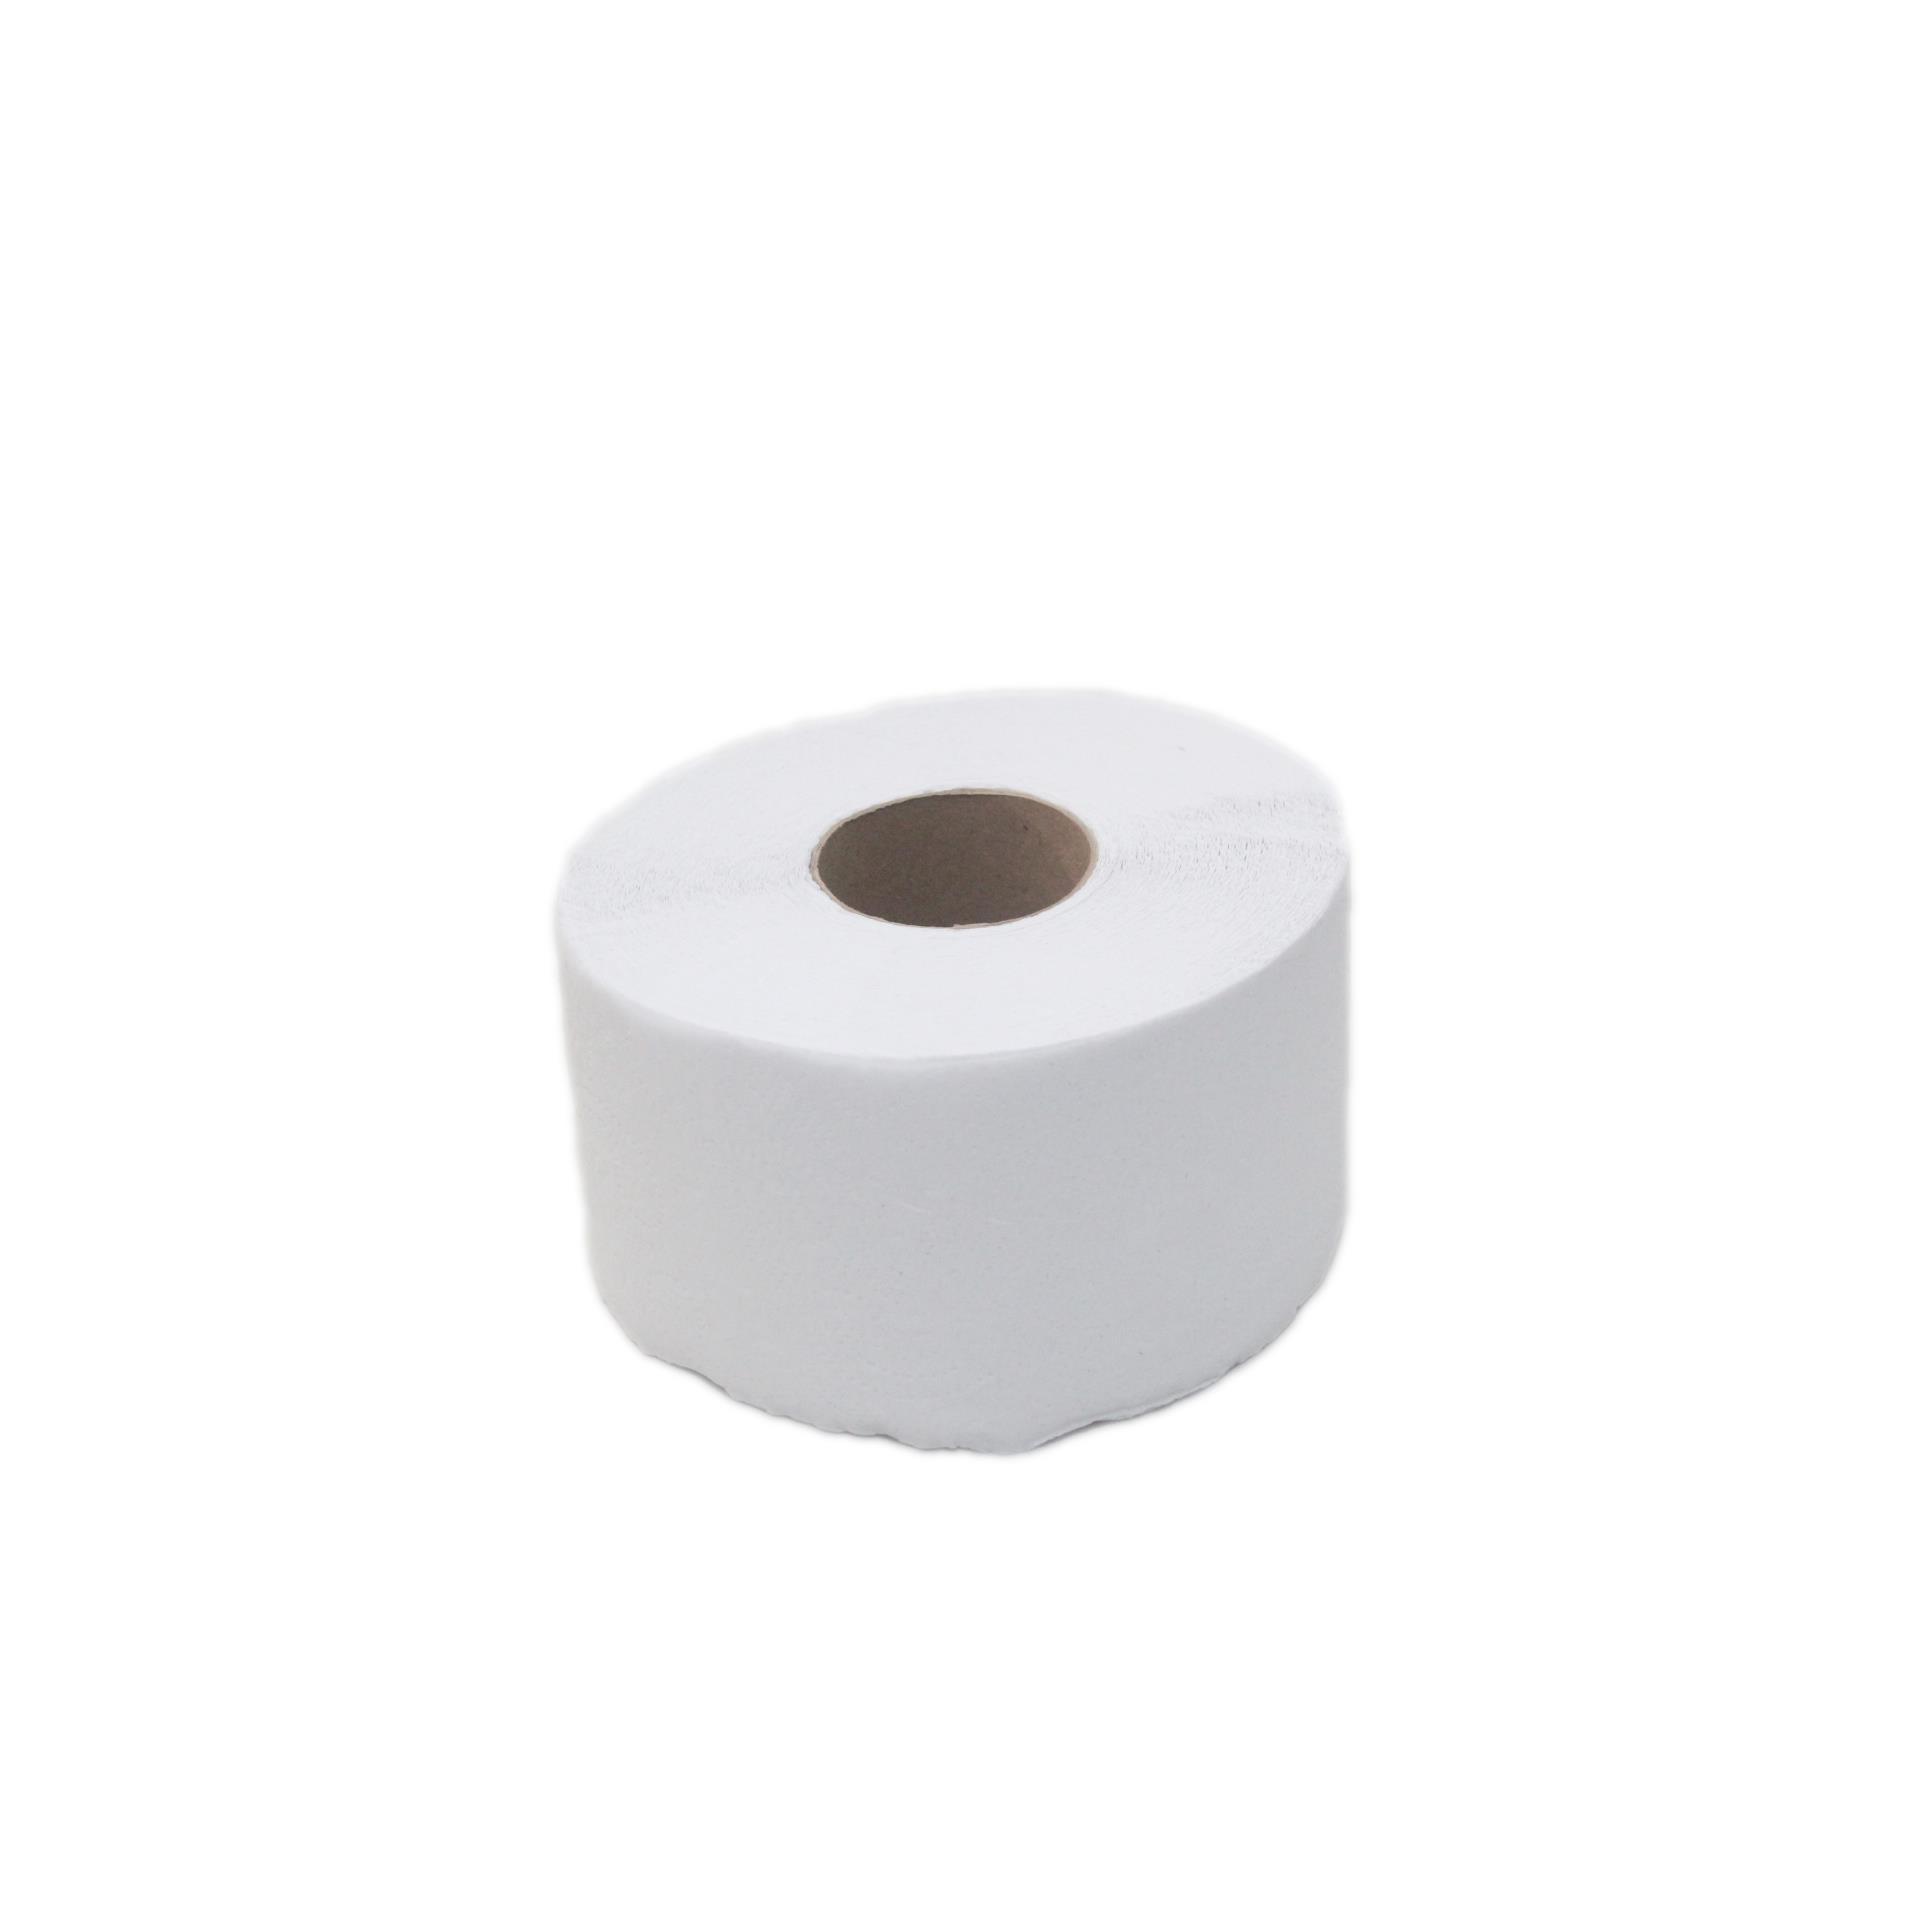 Papel Higienico Eva Plus com 8 Rolos 300m - Original Clean